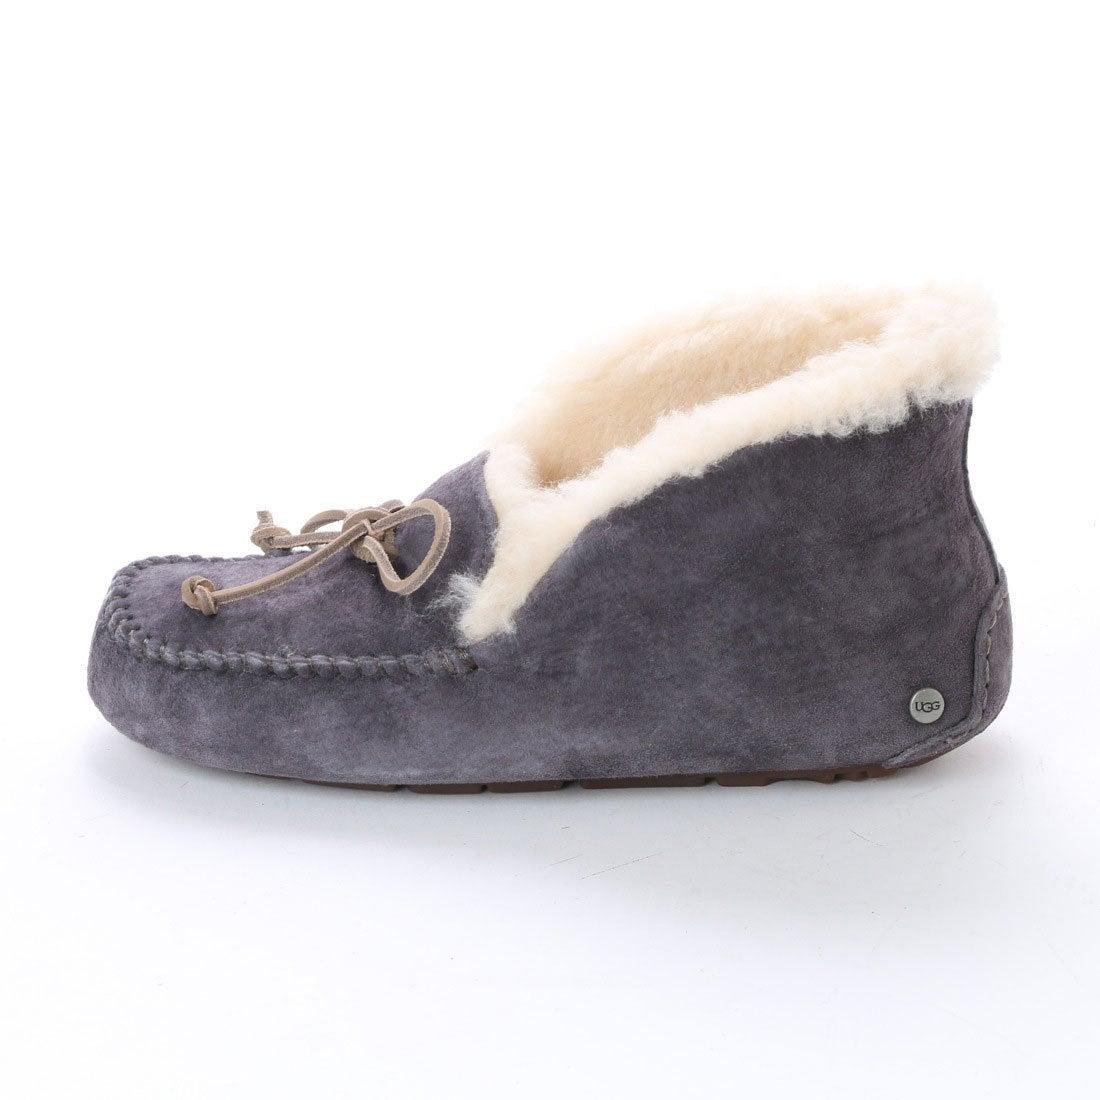 0657a1462719 アグ UGG 1004806 W ALENA (ナイトフォール) -靴&ファッション通販 ...